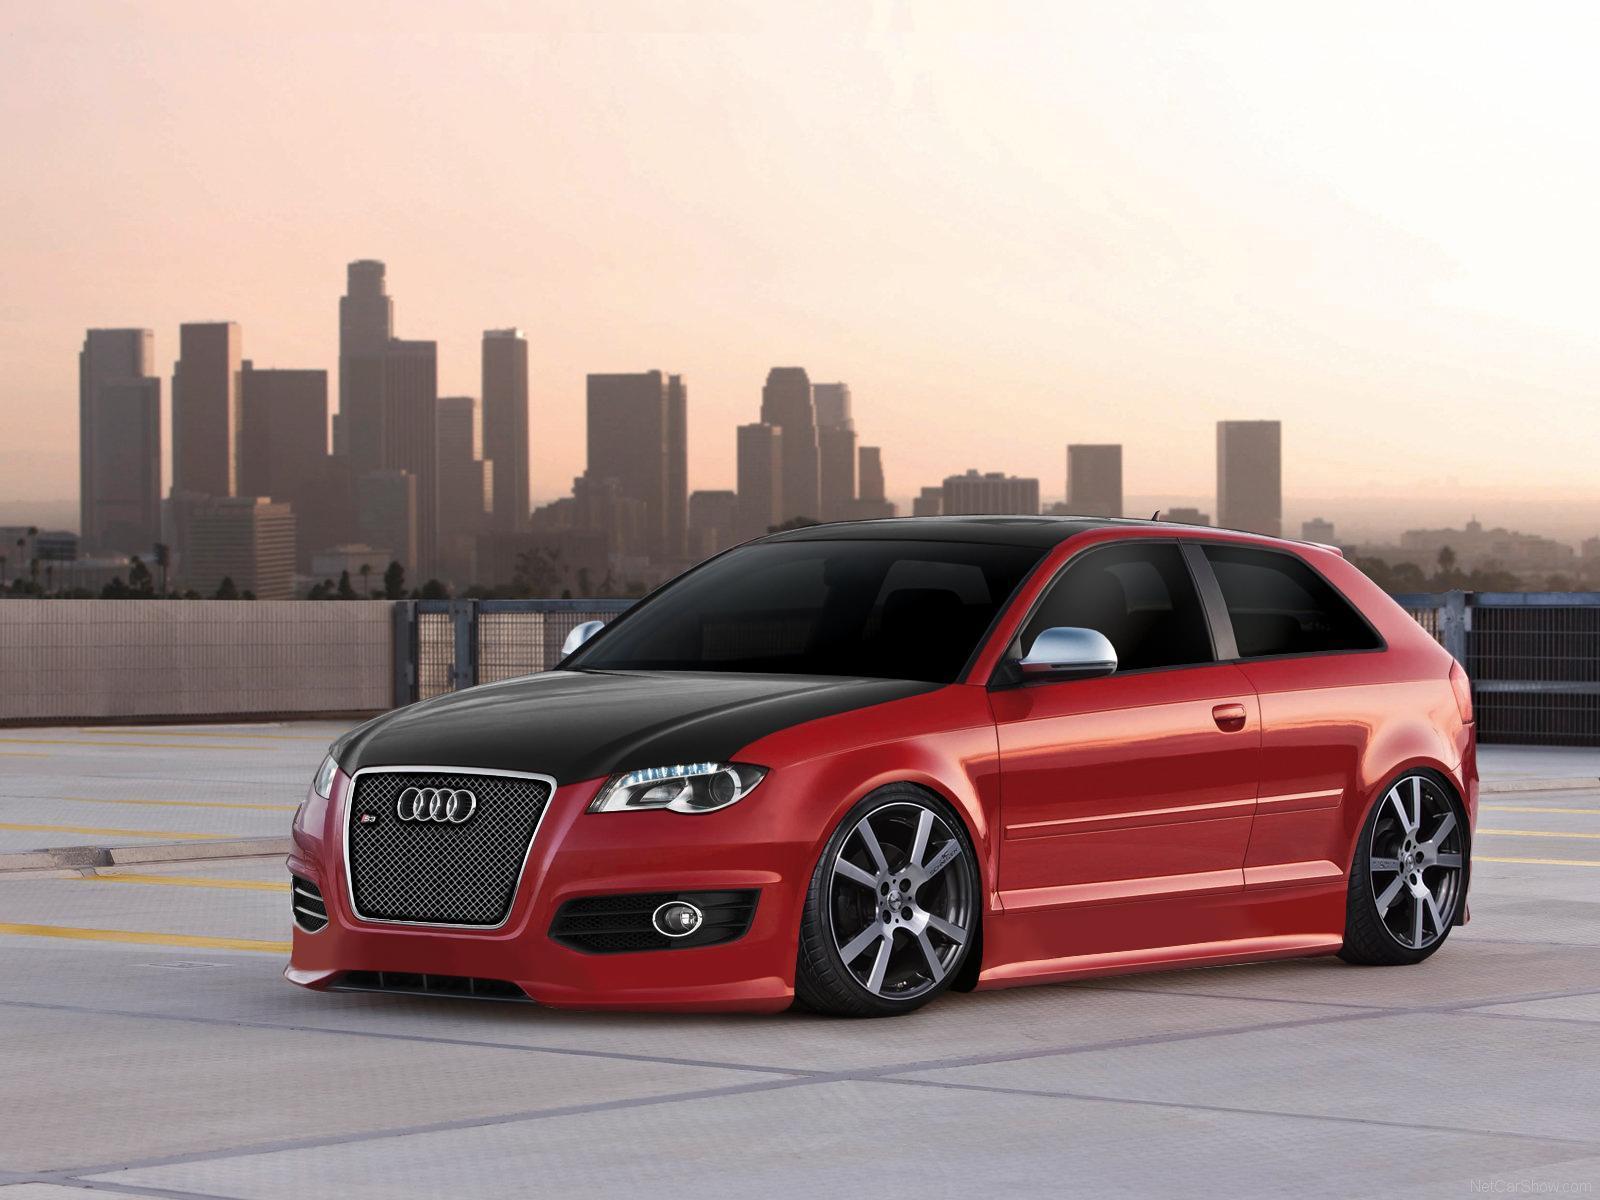 Auto Galeria: Audi S3, Samochody, Tuning, Tapety